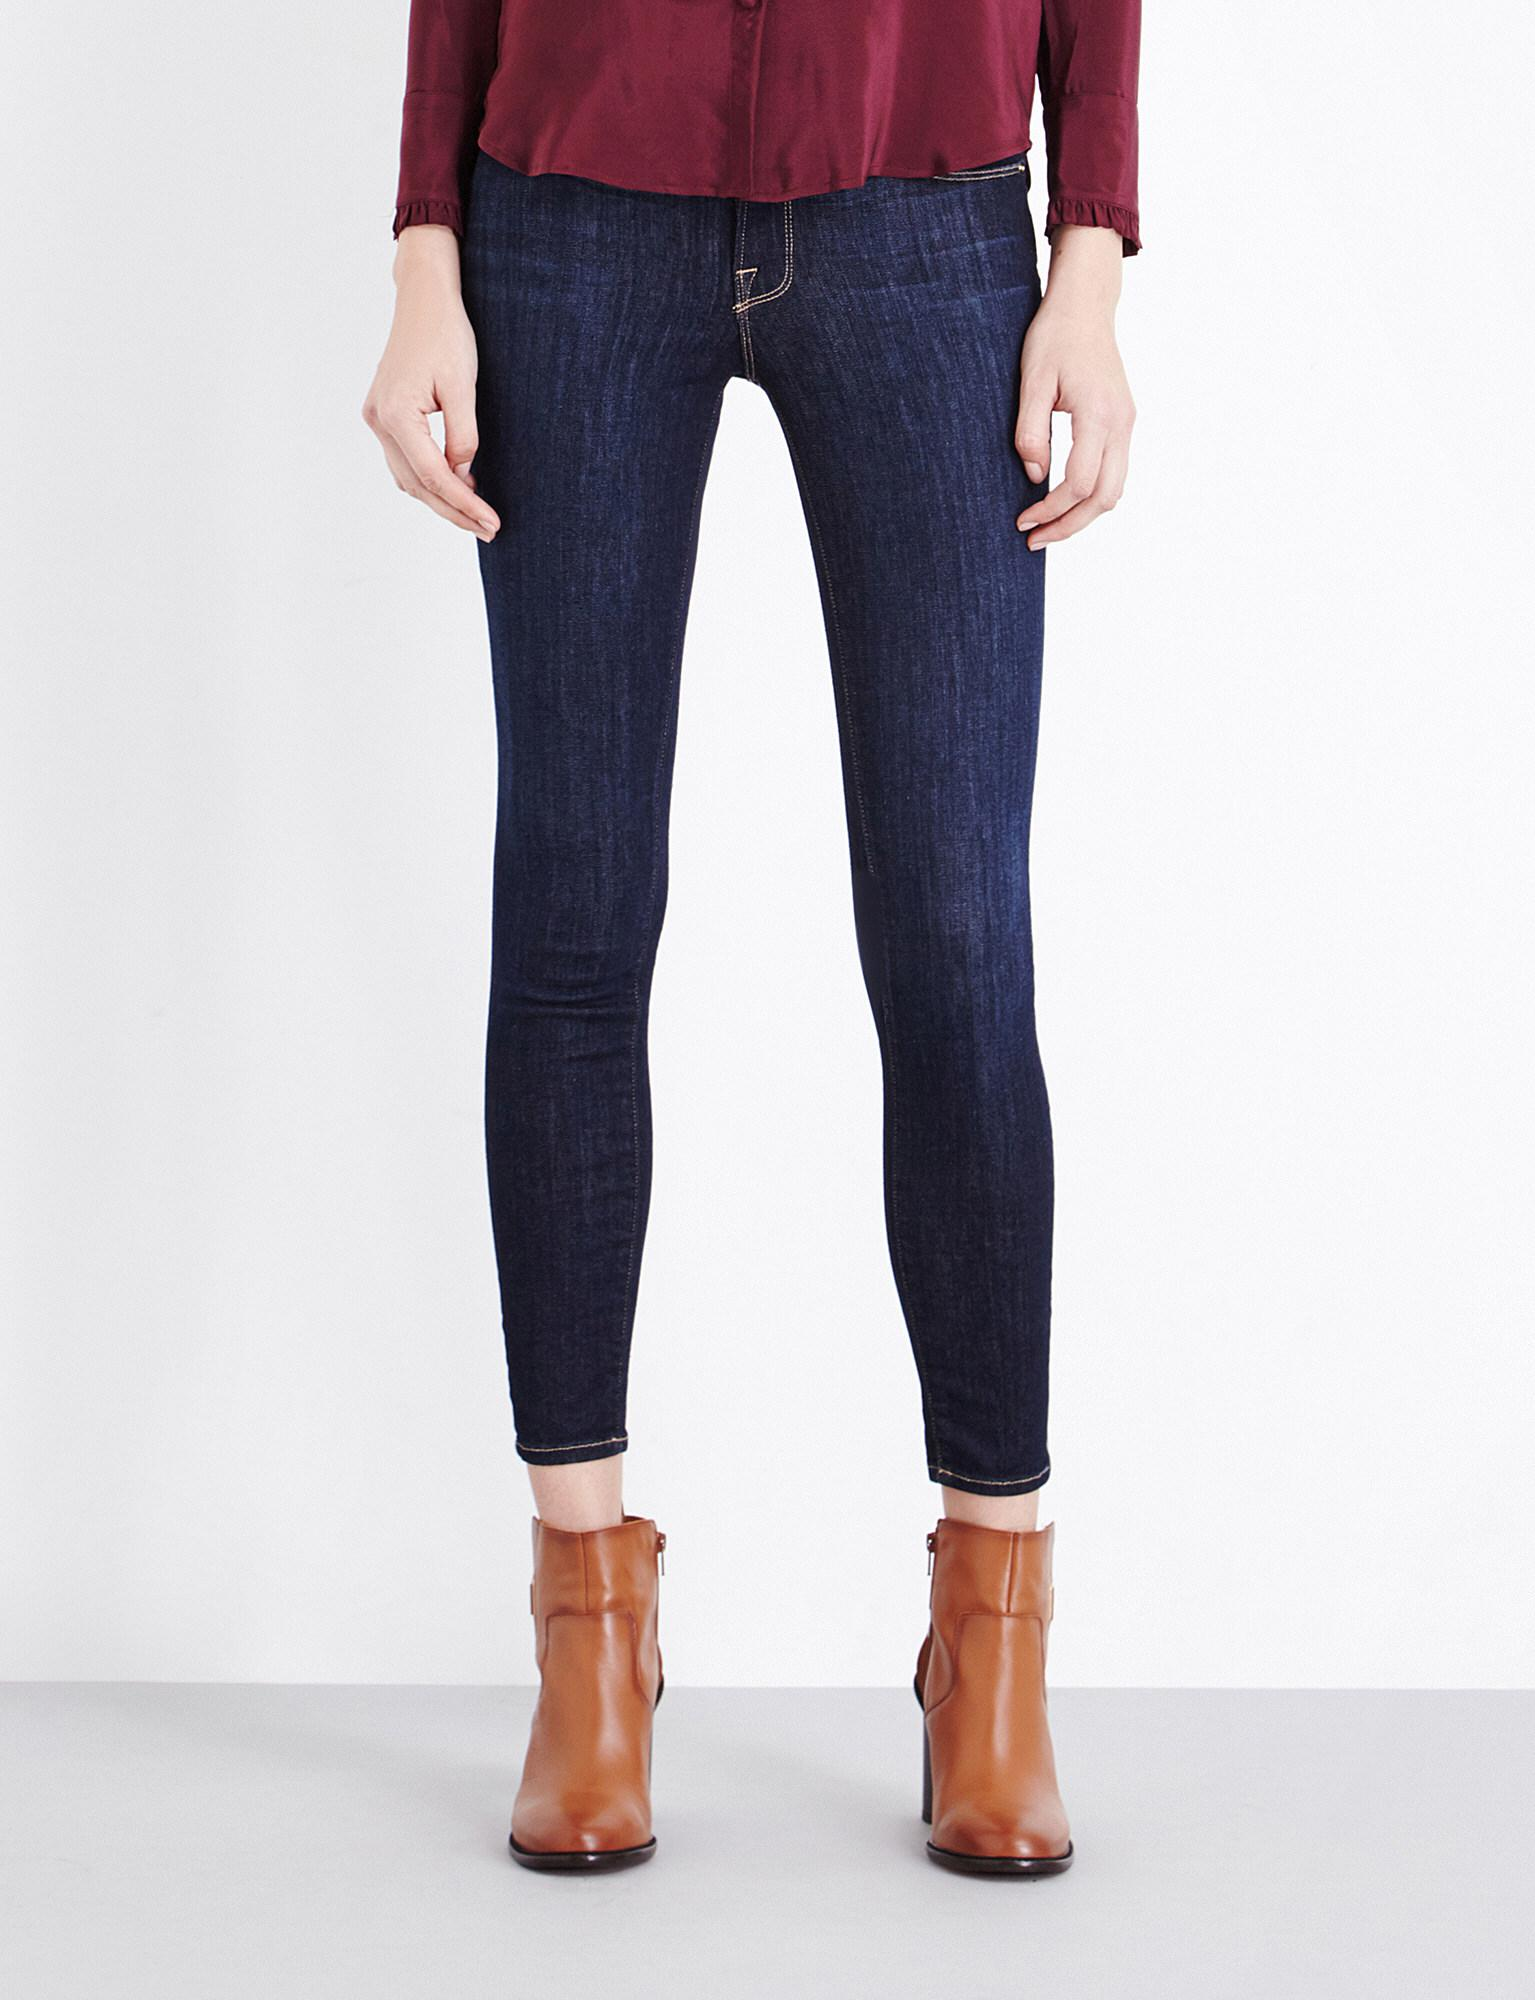 Lyst - Frame Le Skinny De Jeanne Skinny Mid-rise Jeans in Blue